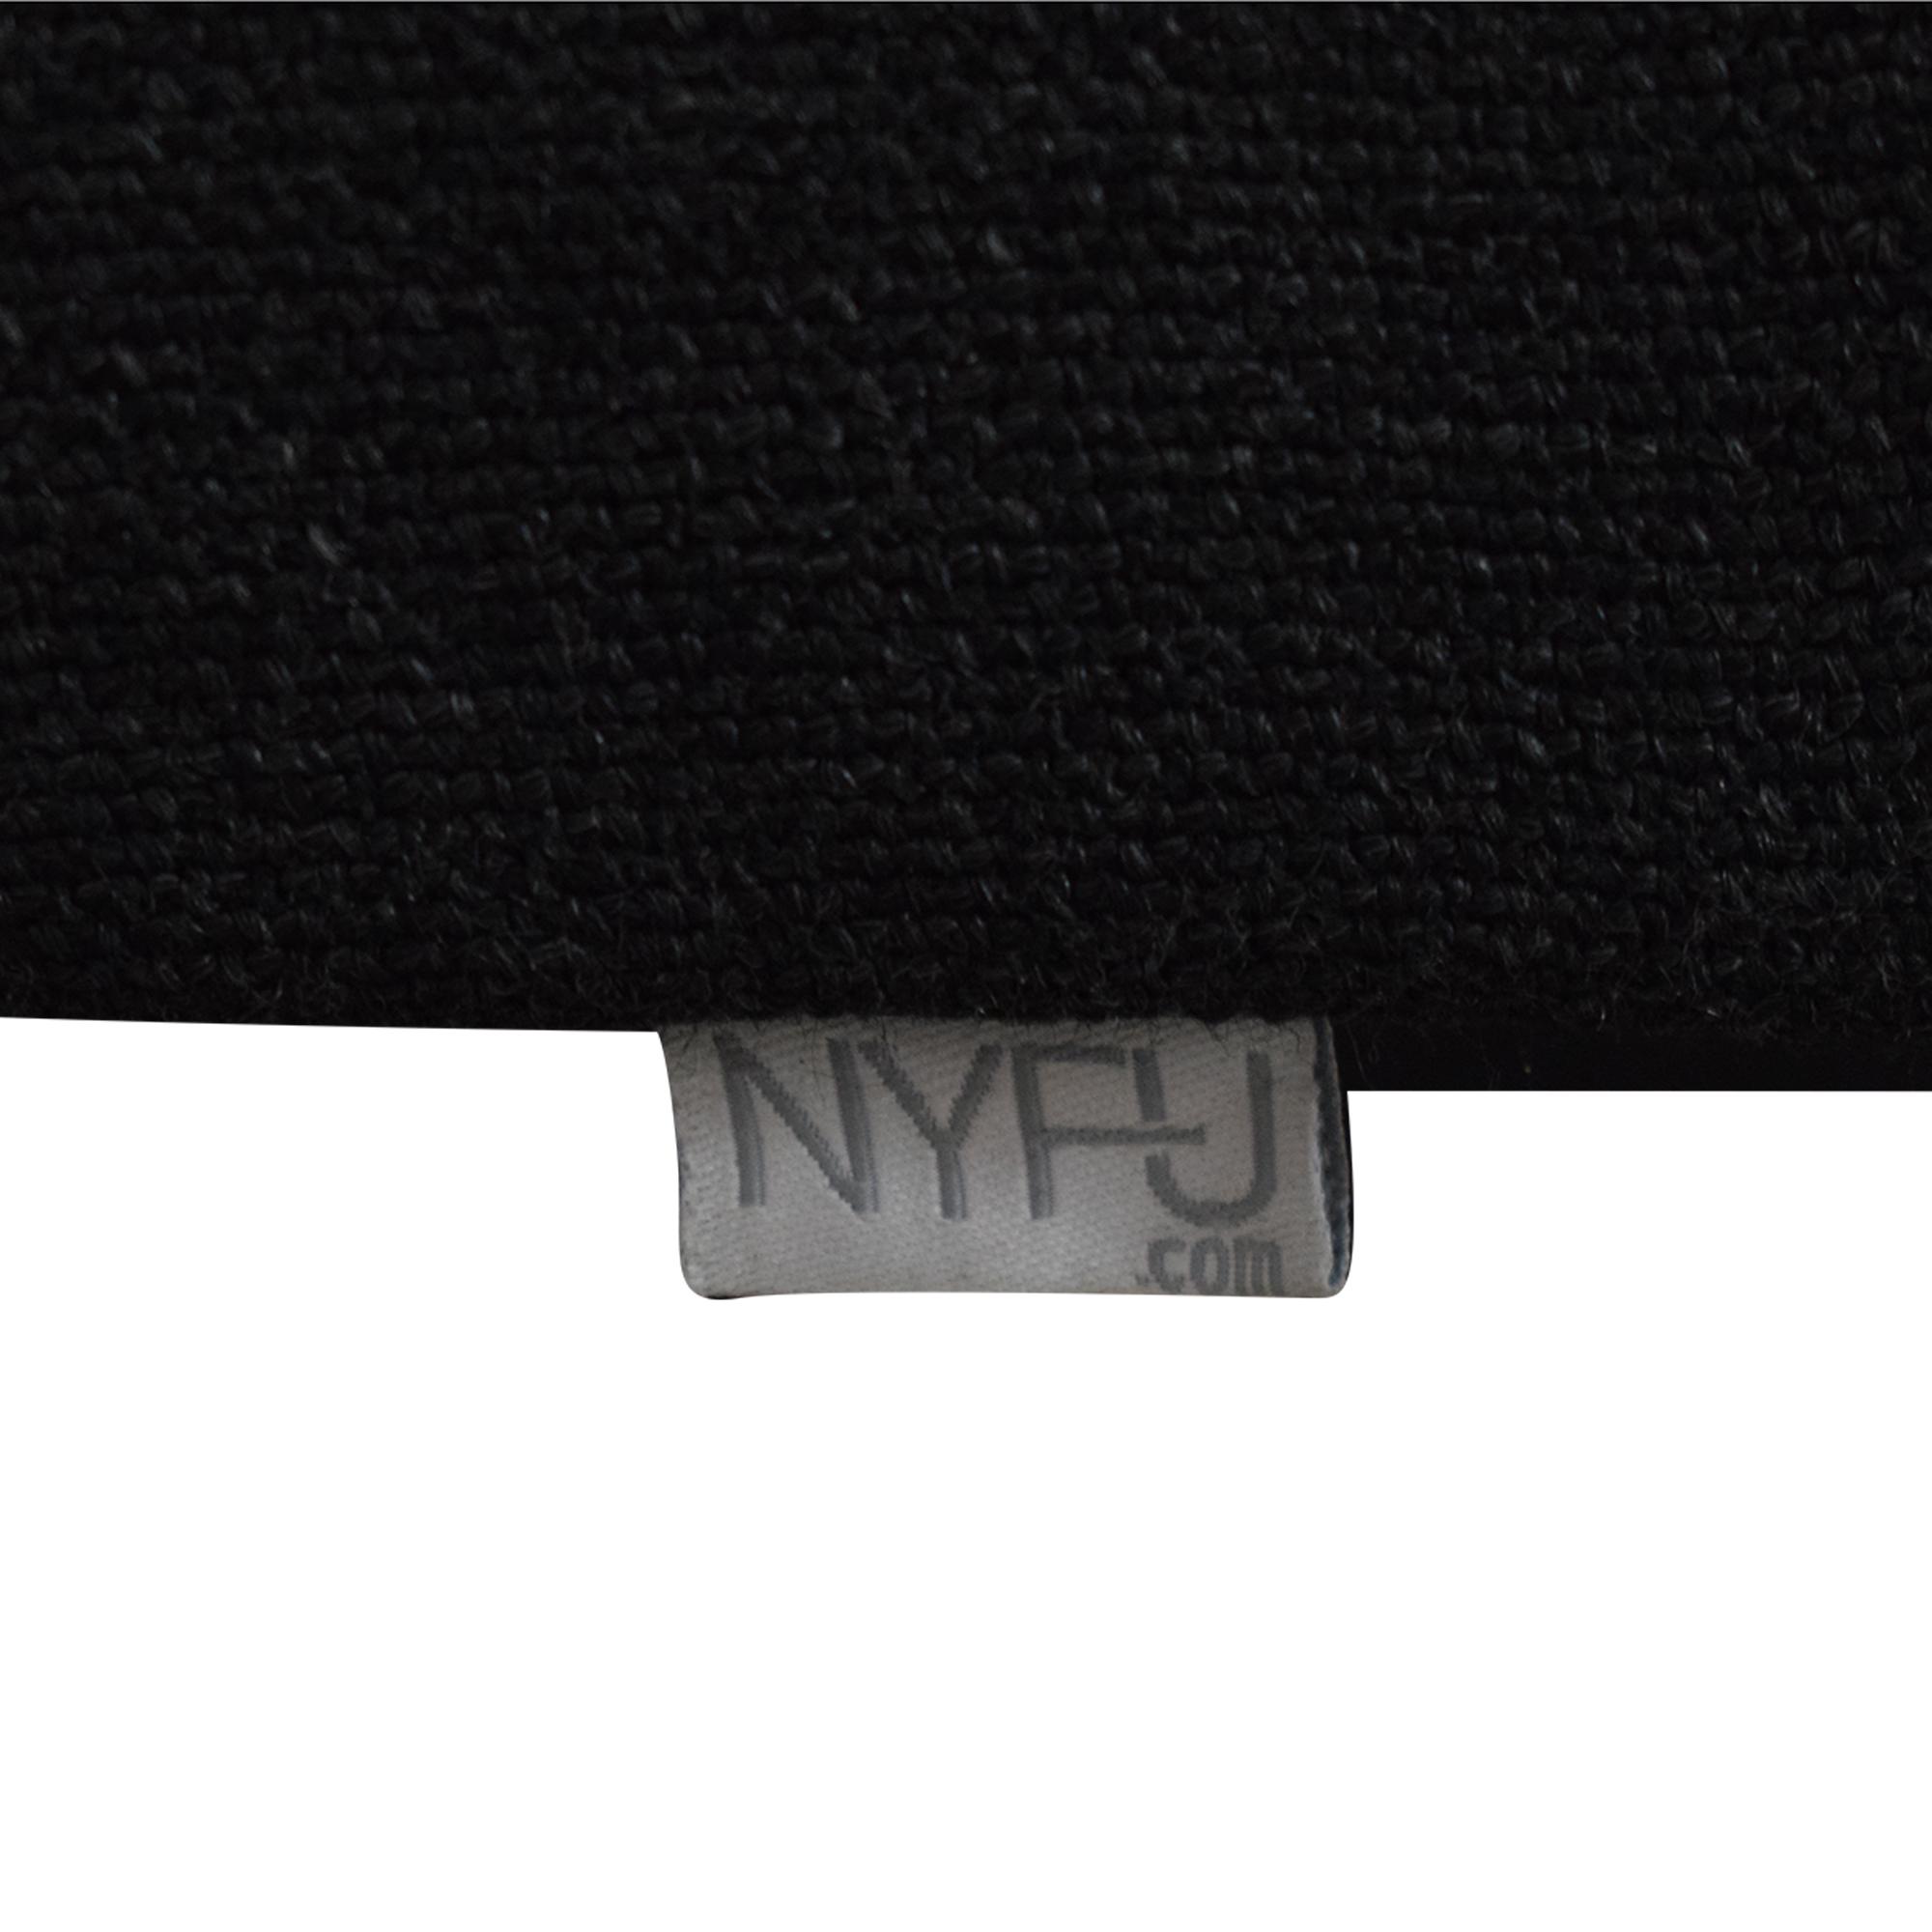 New York Functional Furniture NYFU Convertible Sofa Bed ma